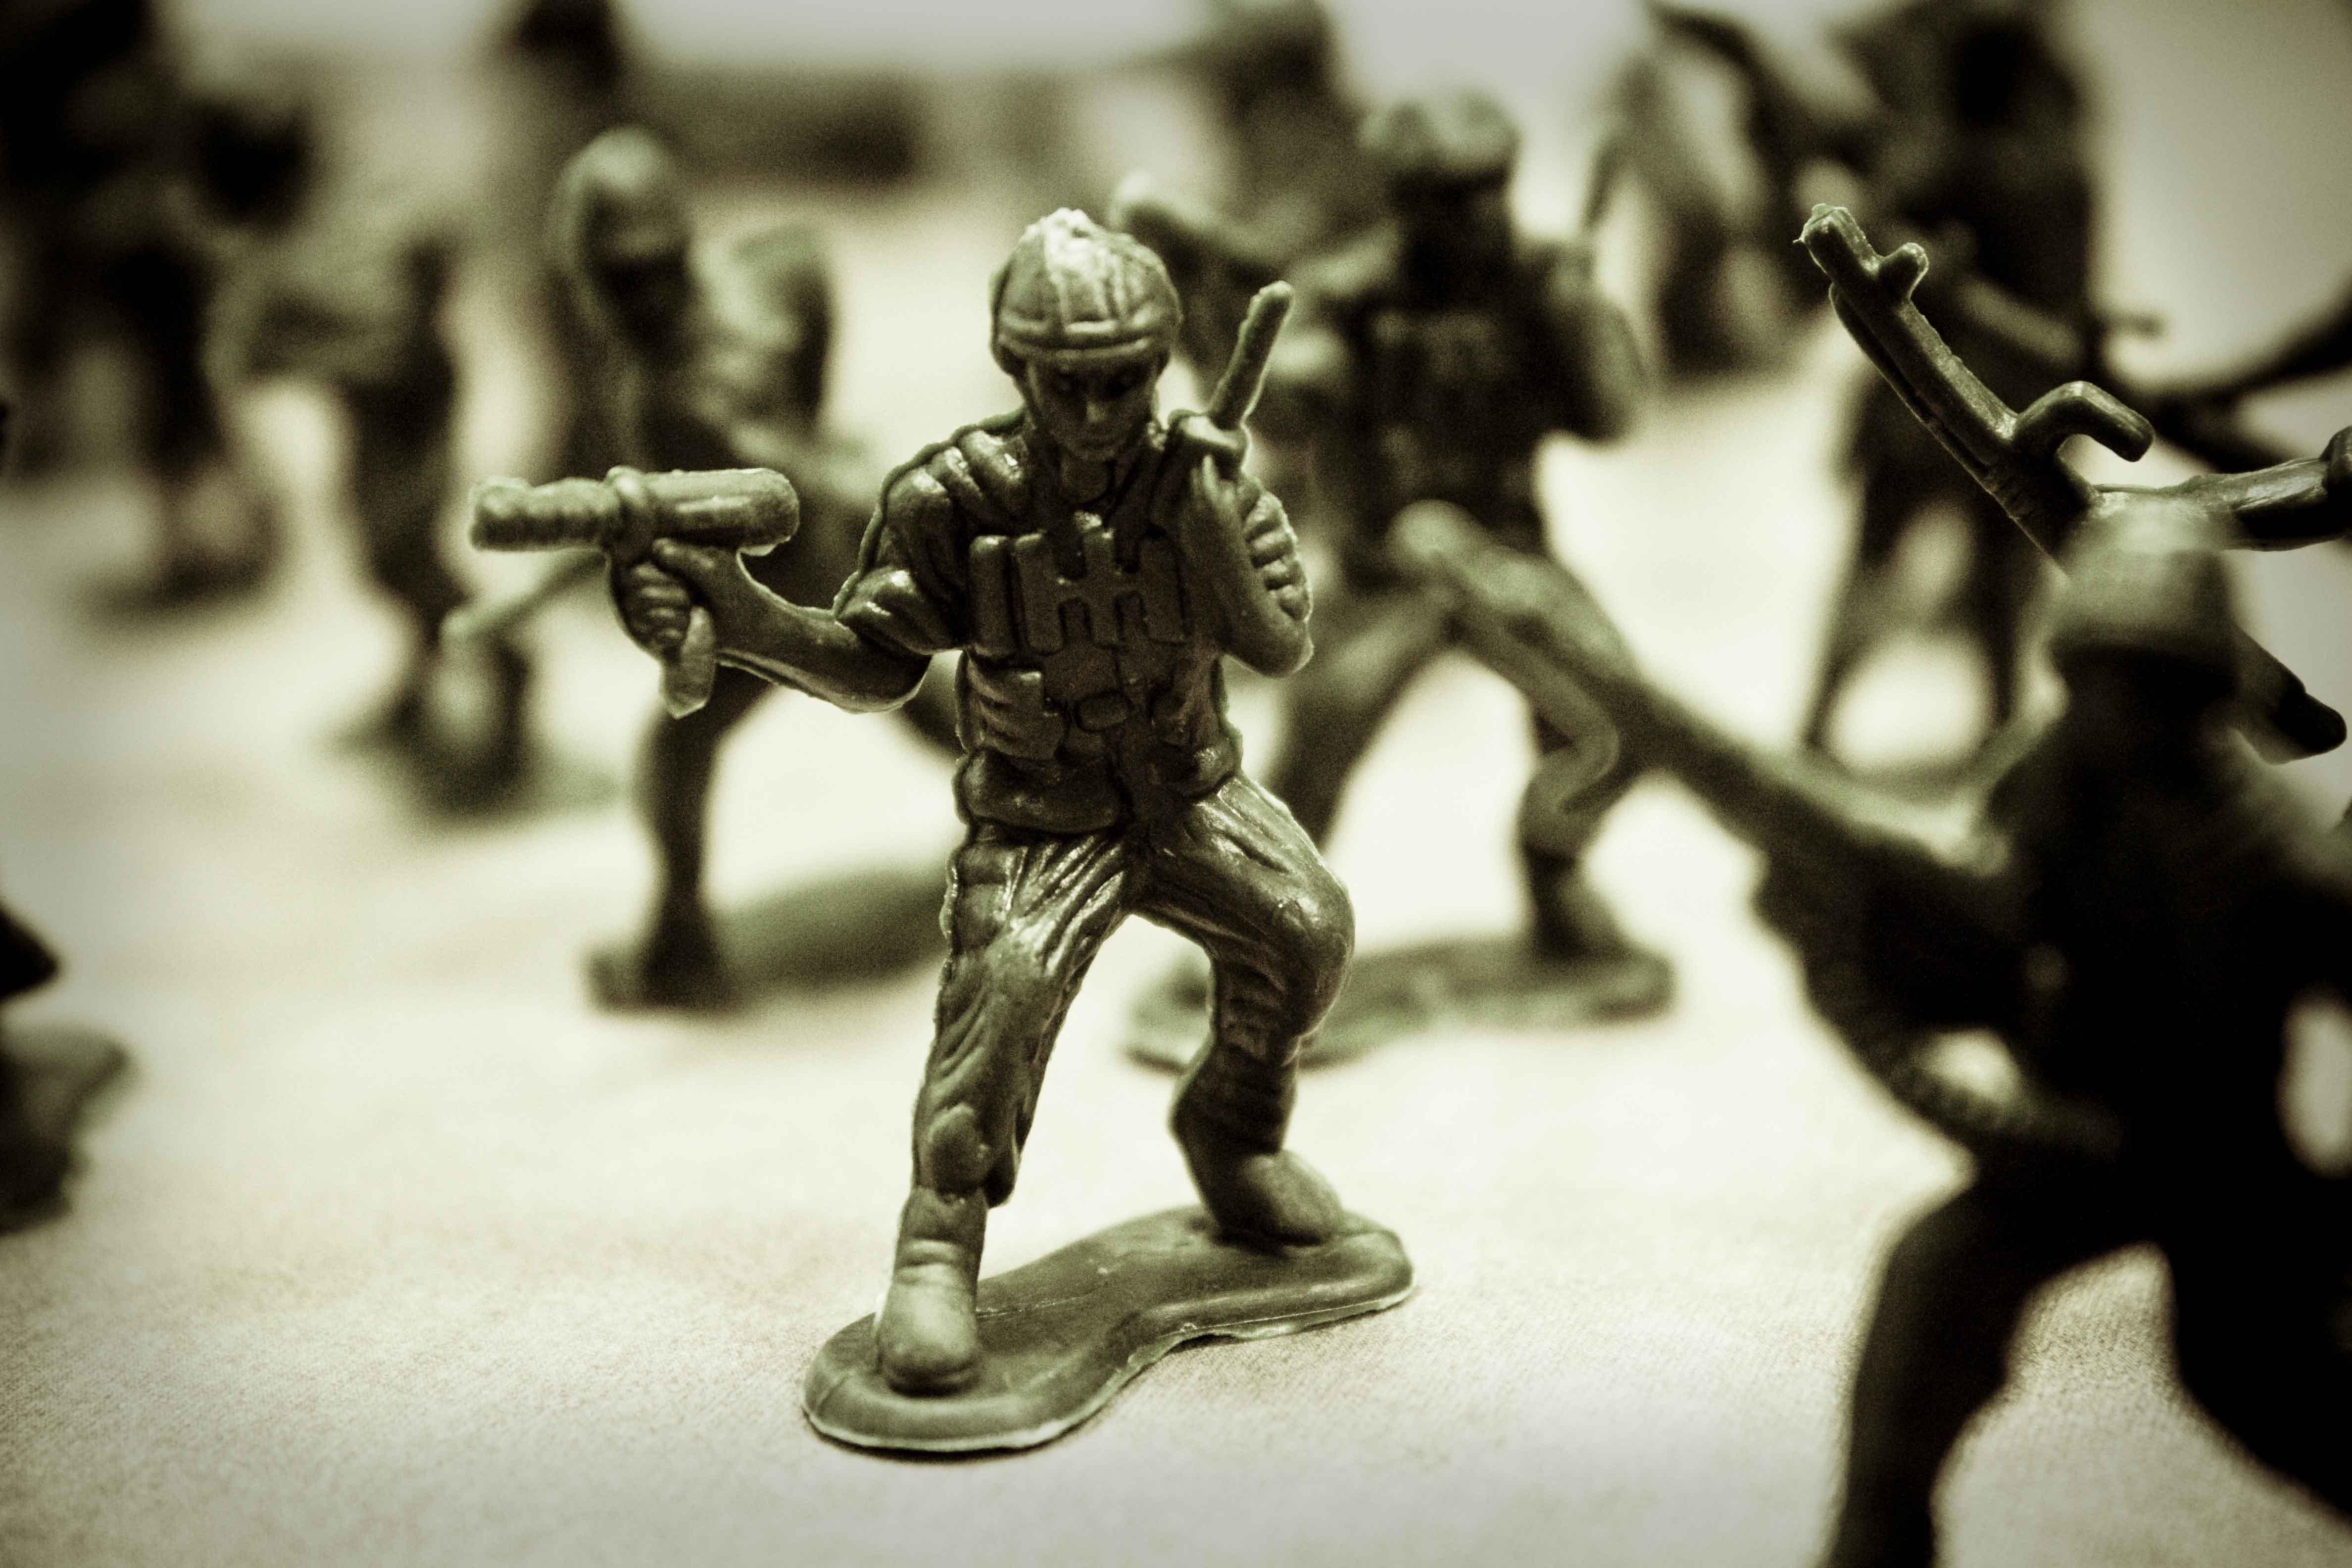 GREEN ARMY MEN toy military toys sol r war wallpaper